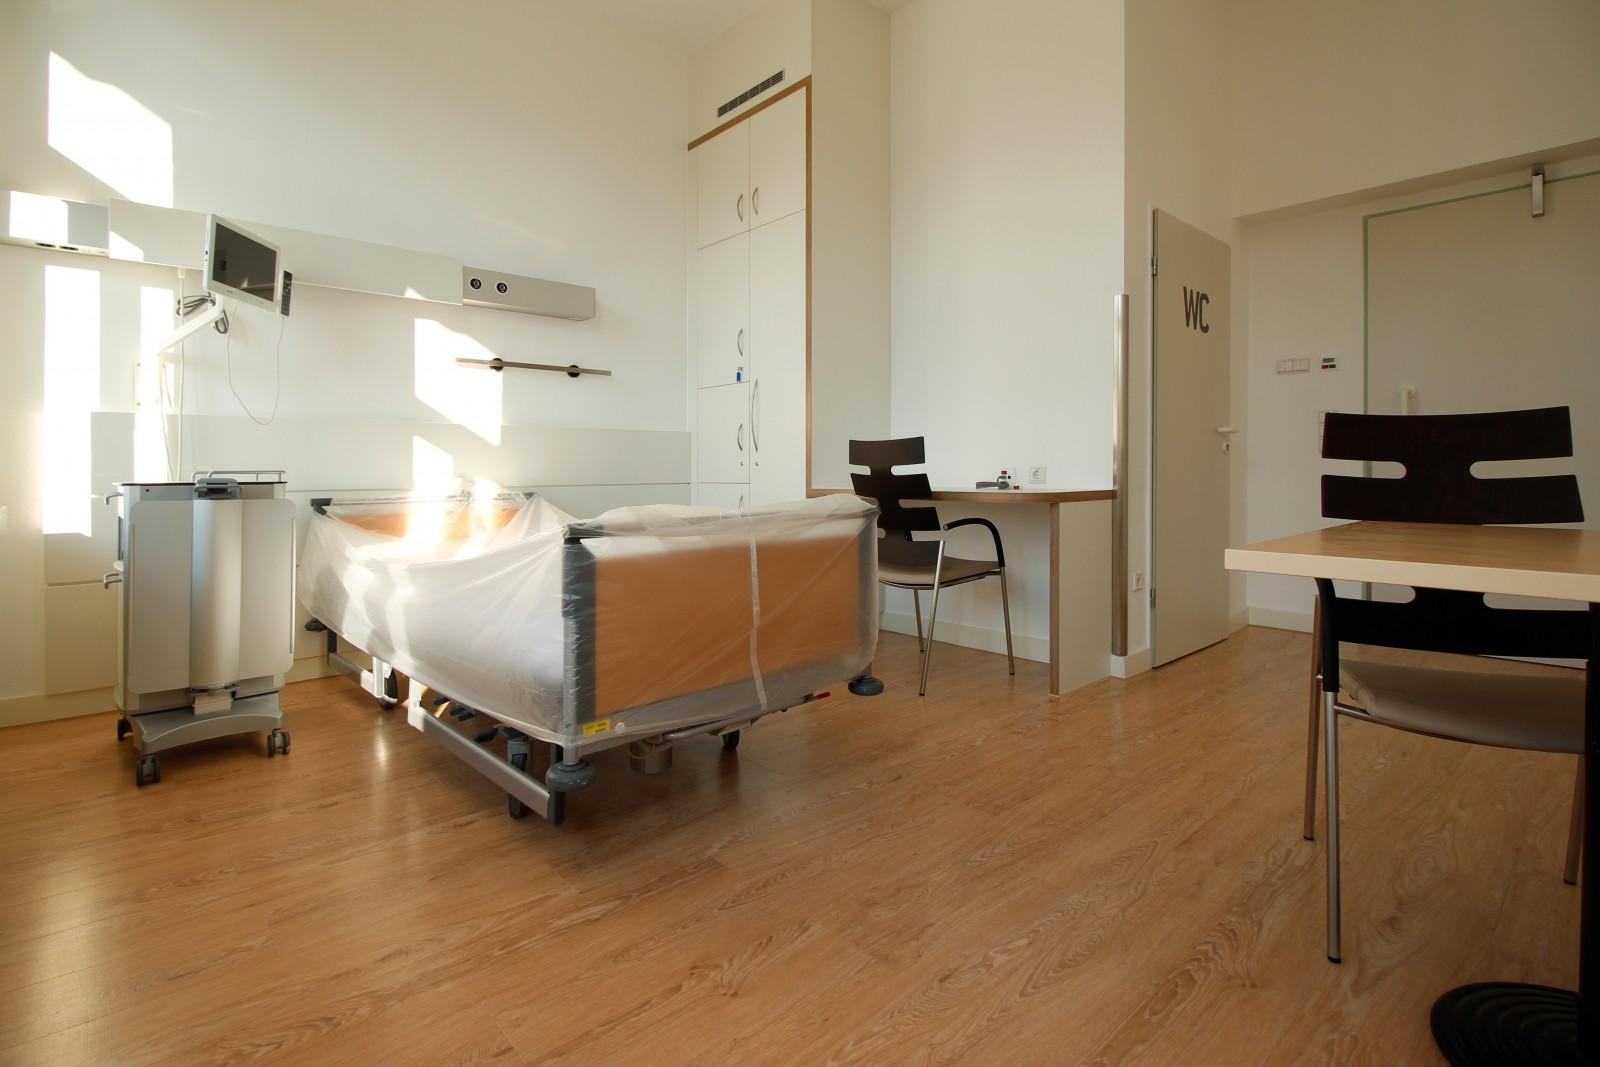 Hüttenhospital Umbau_1-Bettzimmer 1